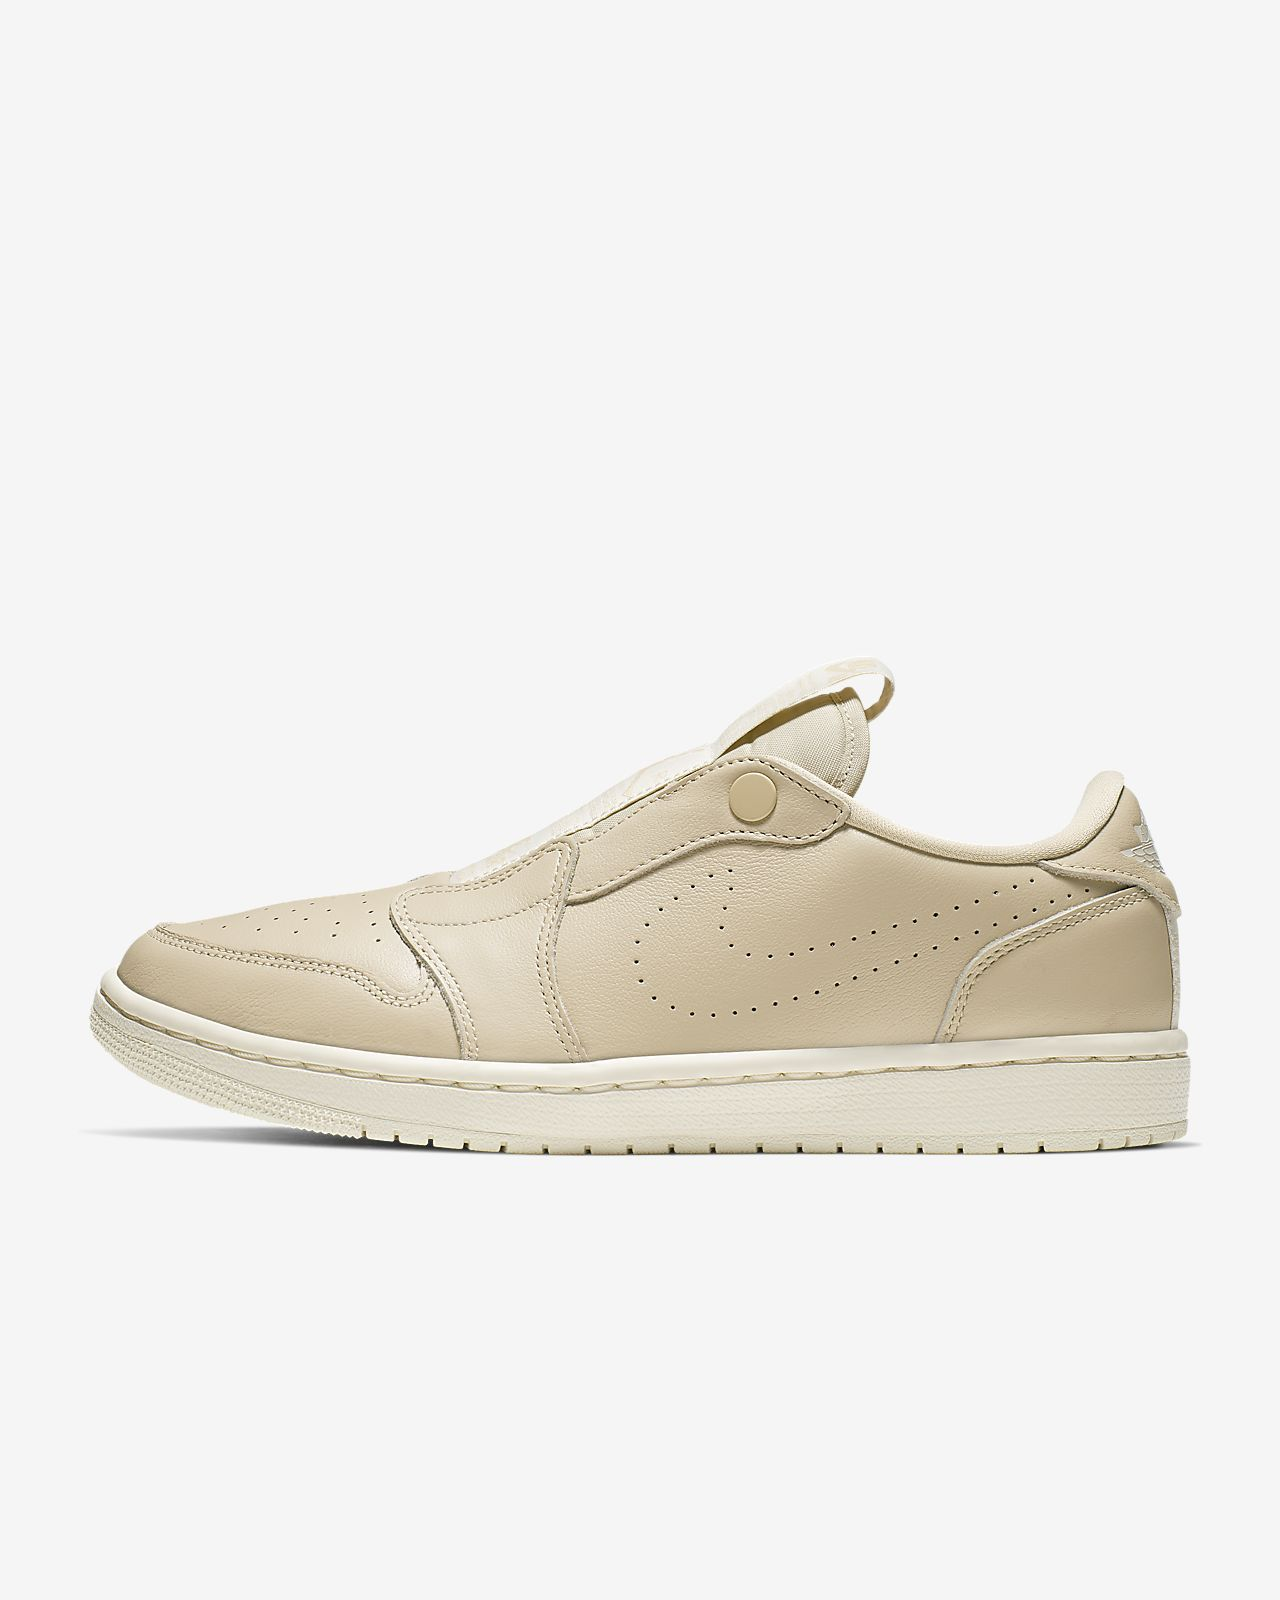 0f297d568d34c7 Air Jordan 1 Retro Low Slip Women s Shoe. Nike.com GB